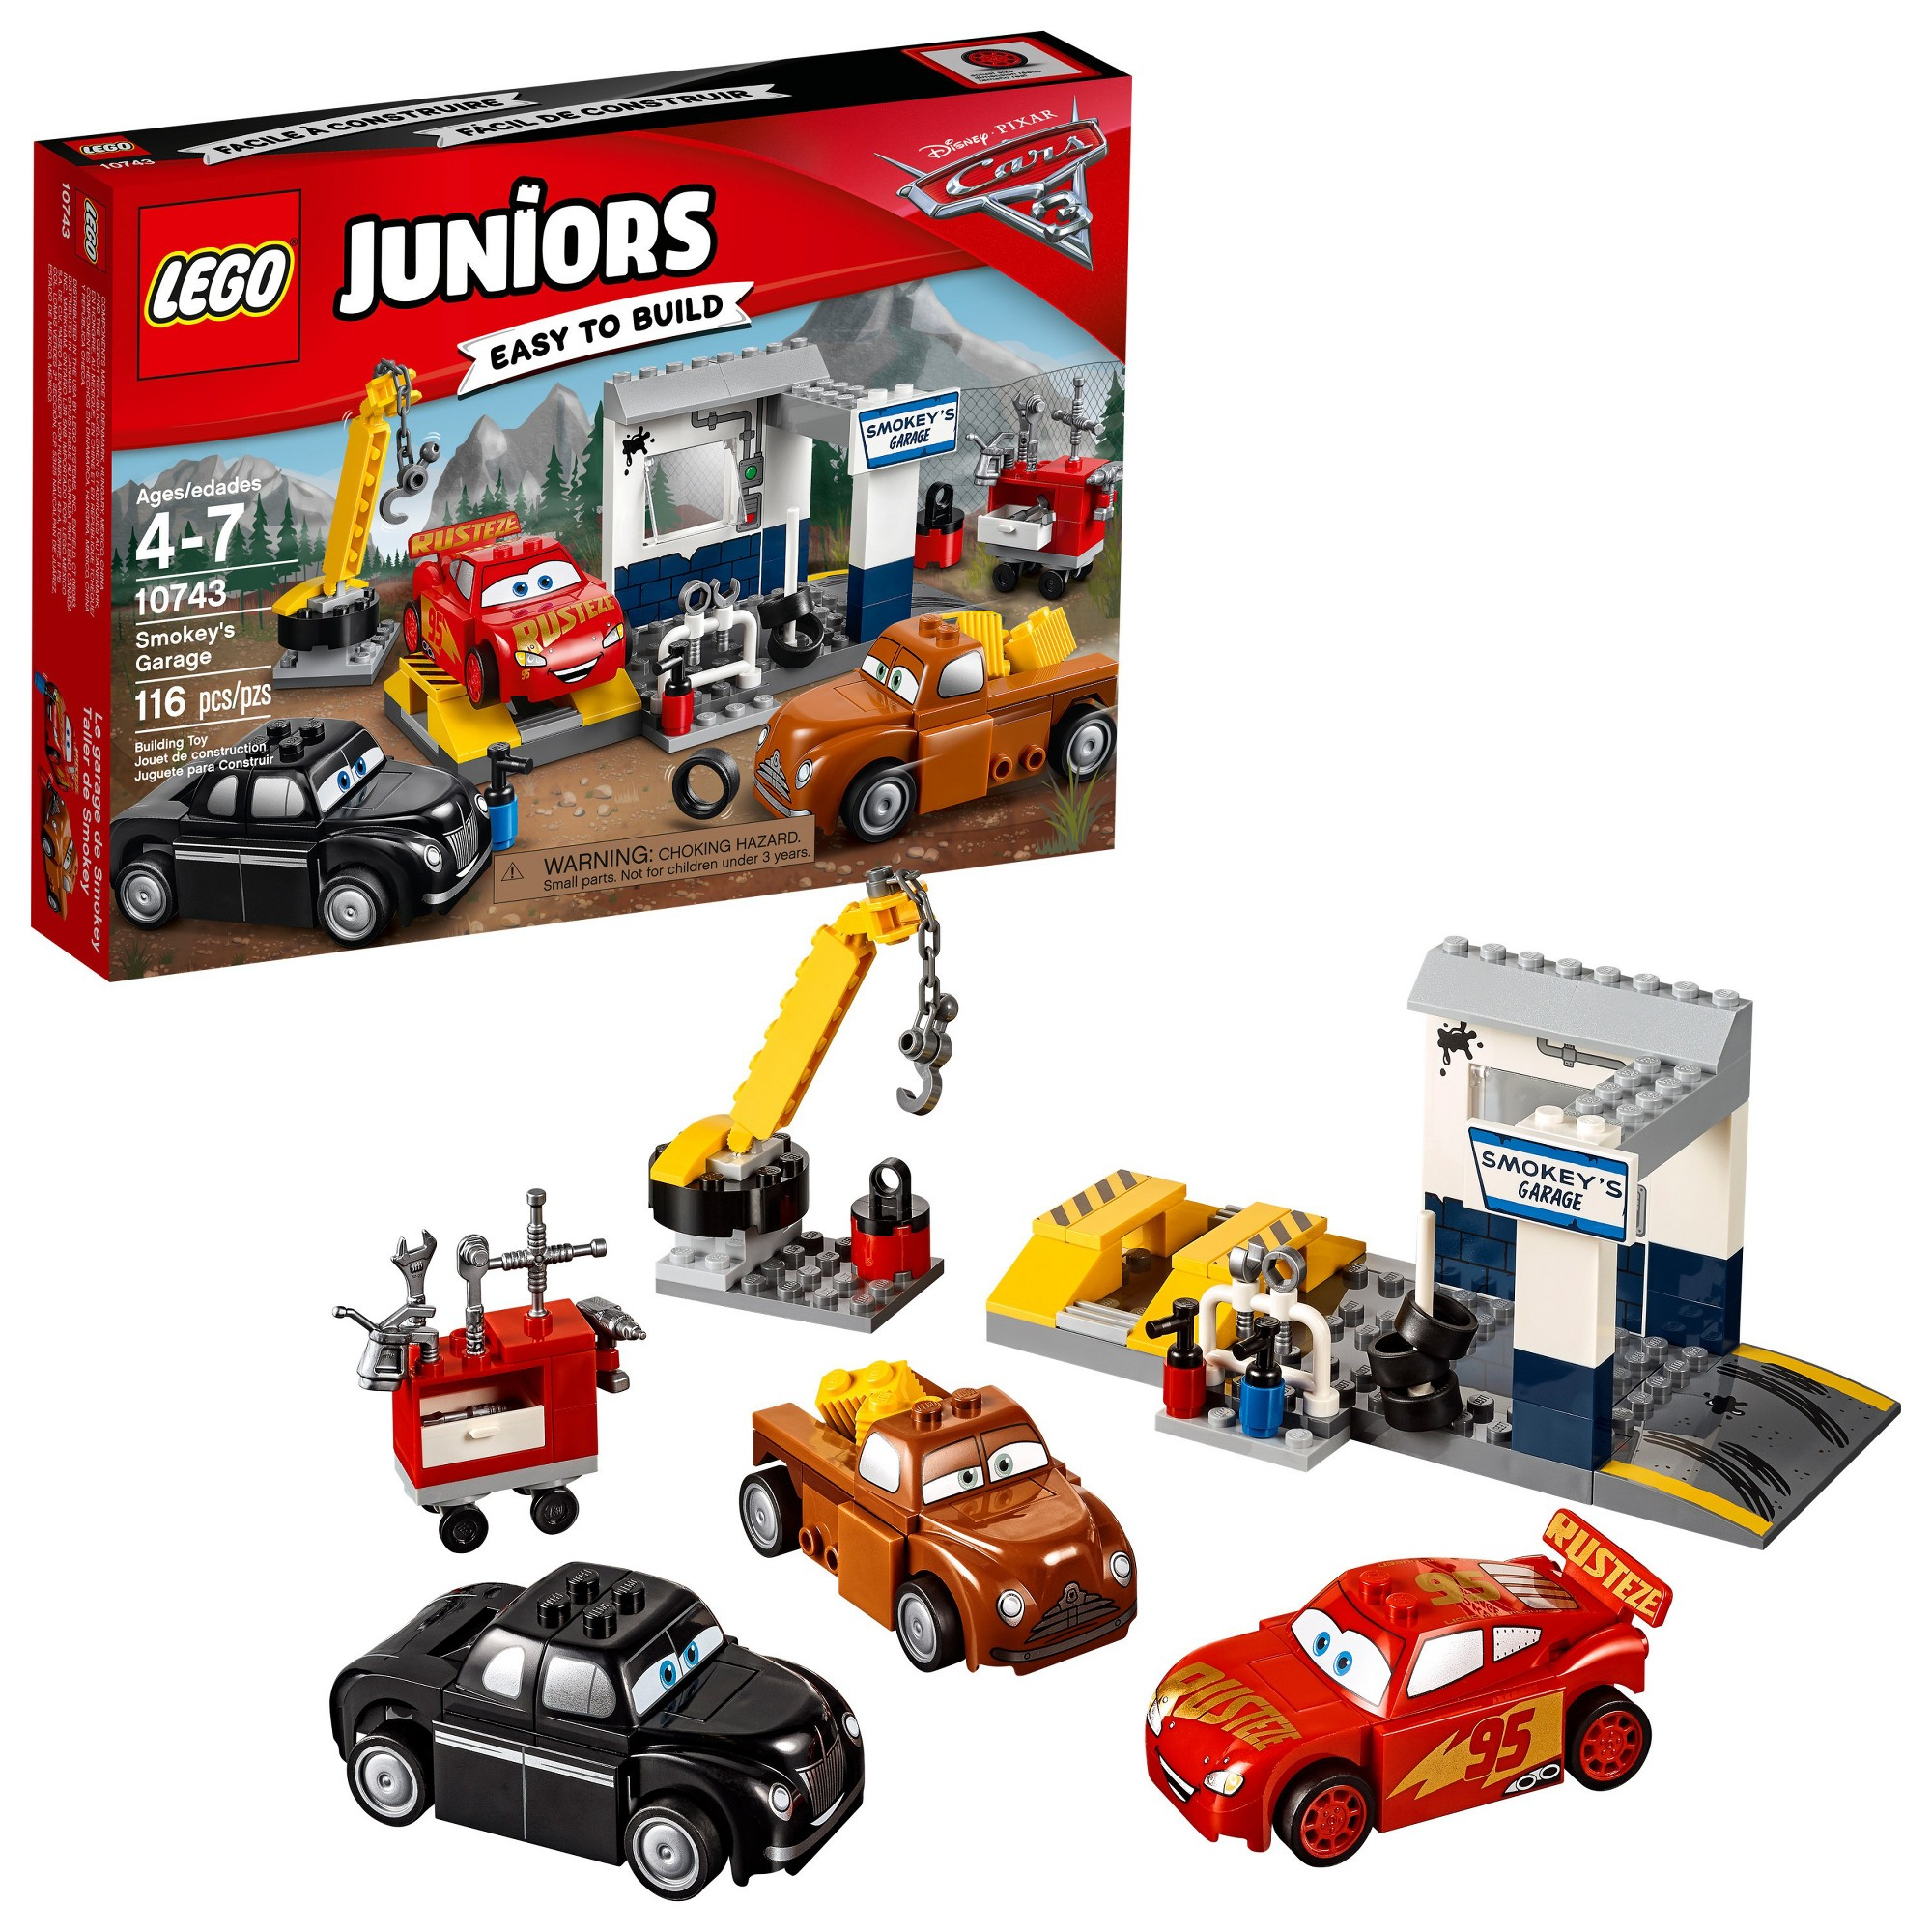 Lego Juniors Disneypixar Cars 3 Smokey S Garage 10743 Lego Juniors Lego Junior Sets Disney Pixar Cars